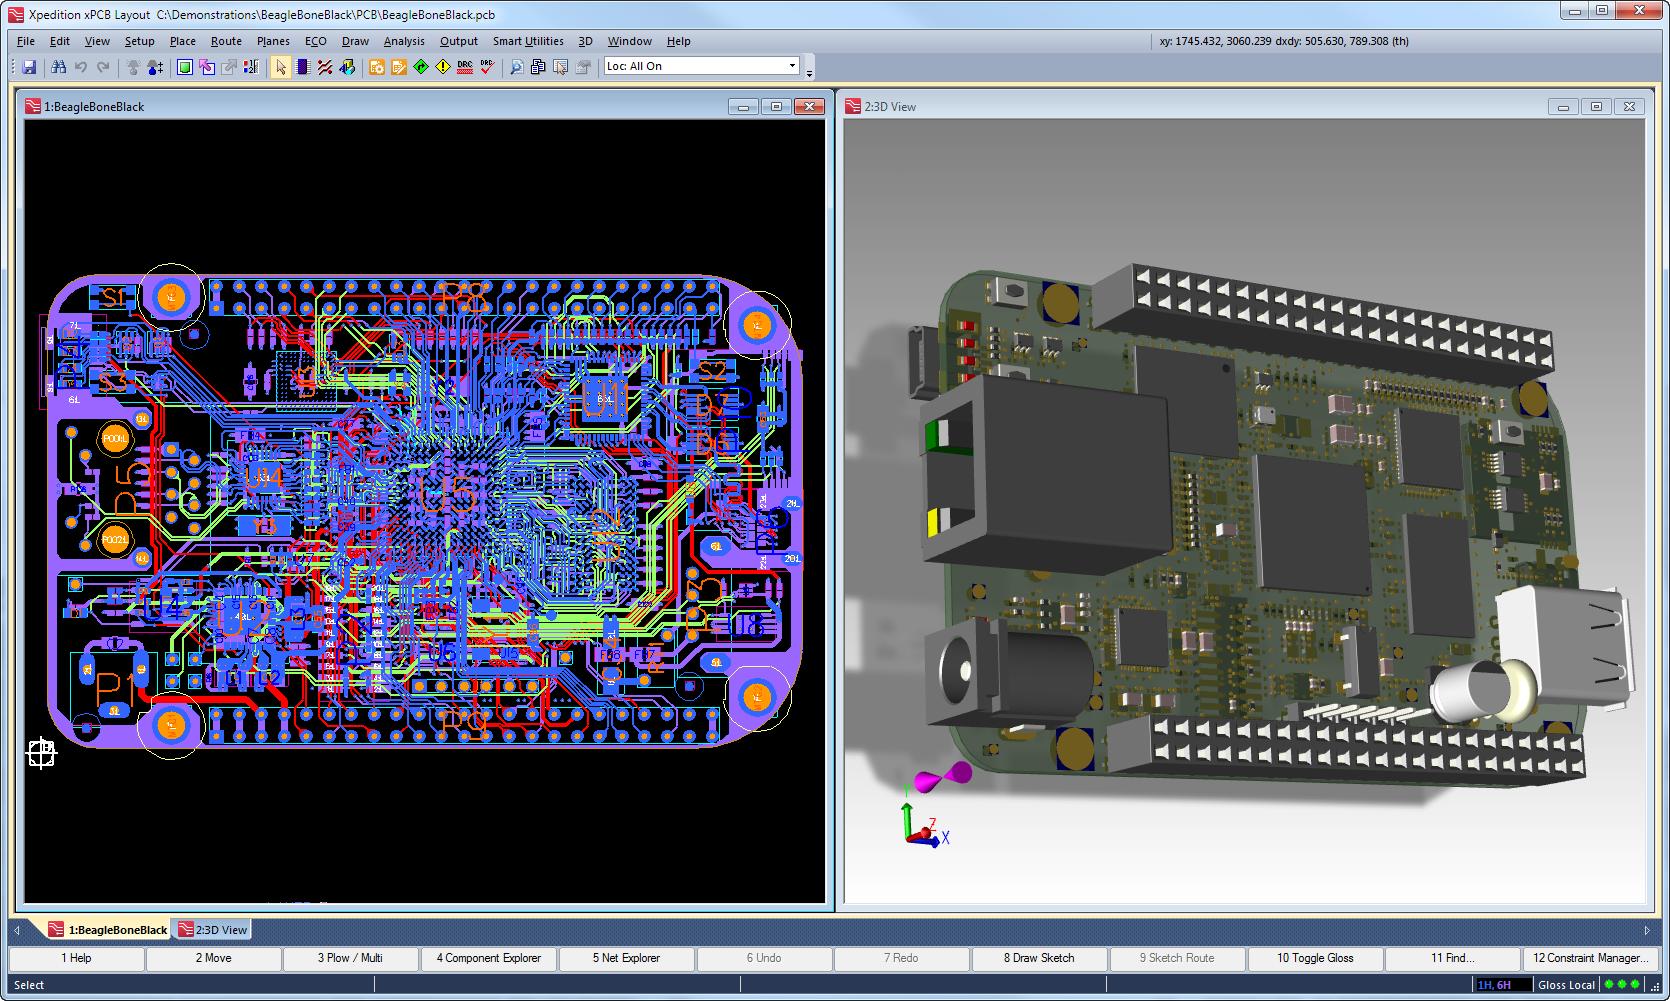 Luxury Pcb Tool Image - Electrical Circuit Diagram Ideas - suaiphone.org